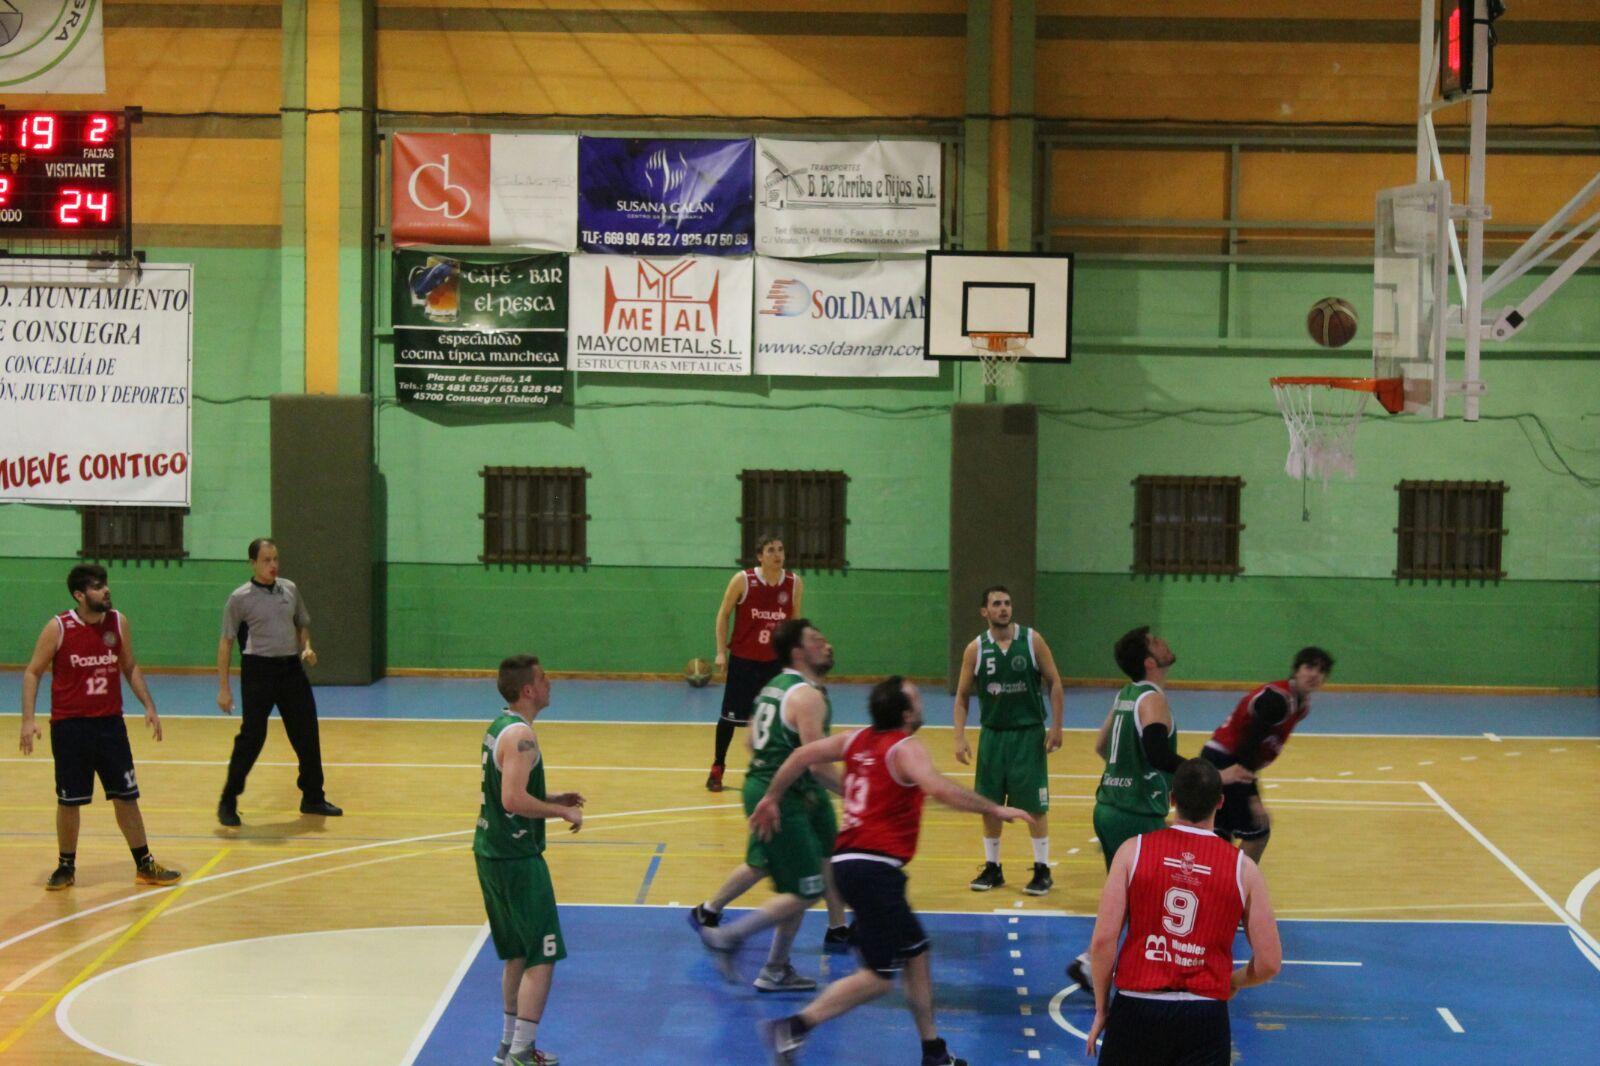 Club Baloncesto Pozuelo de Calatrava